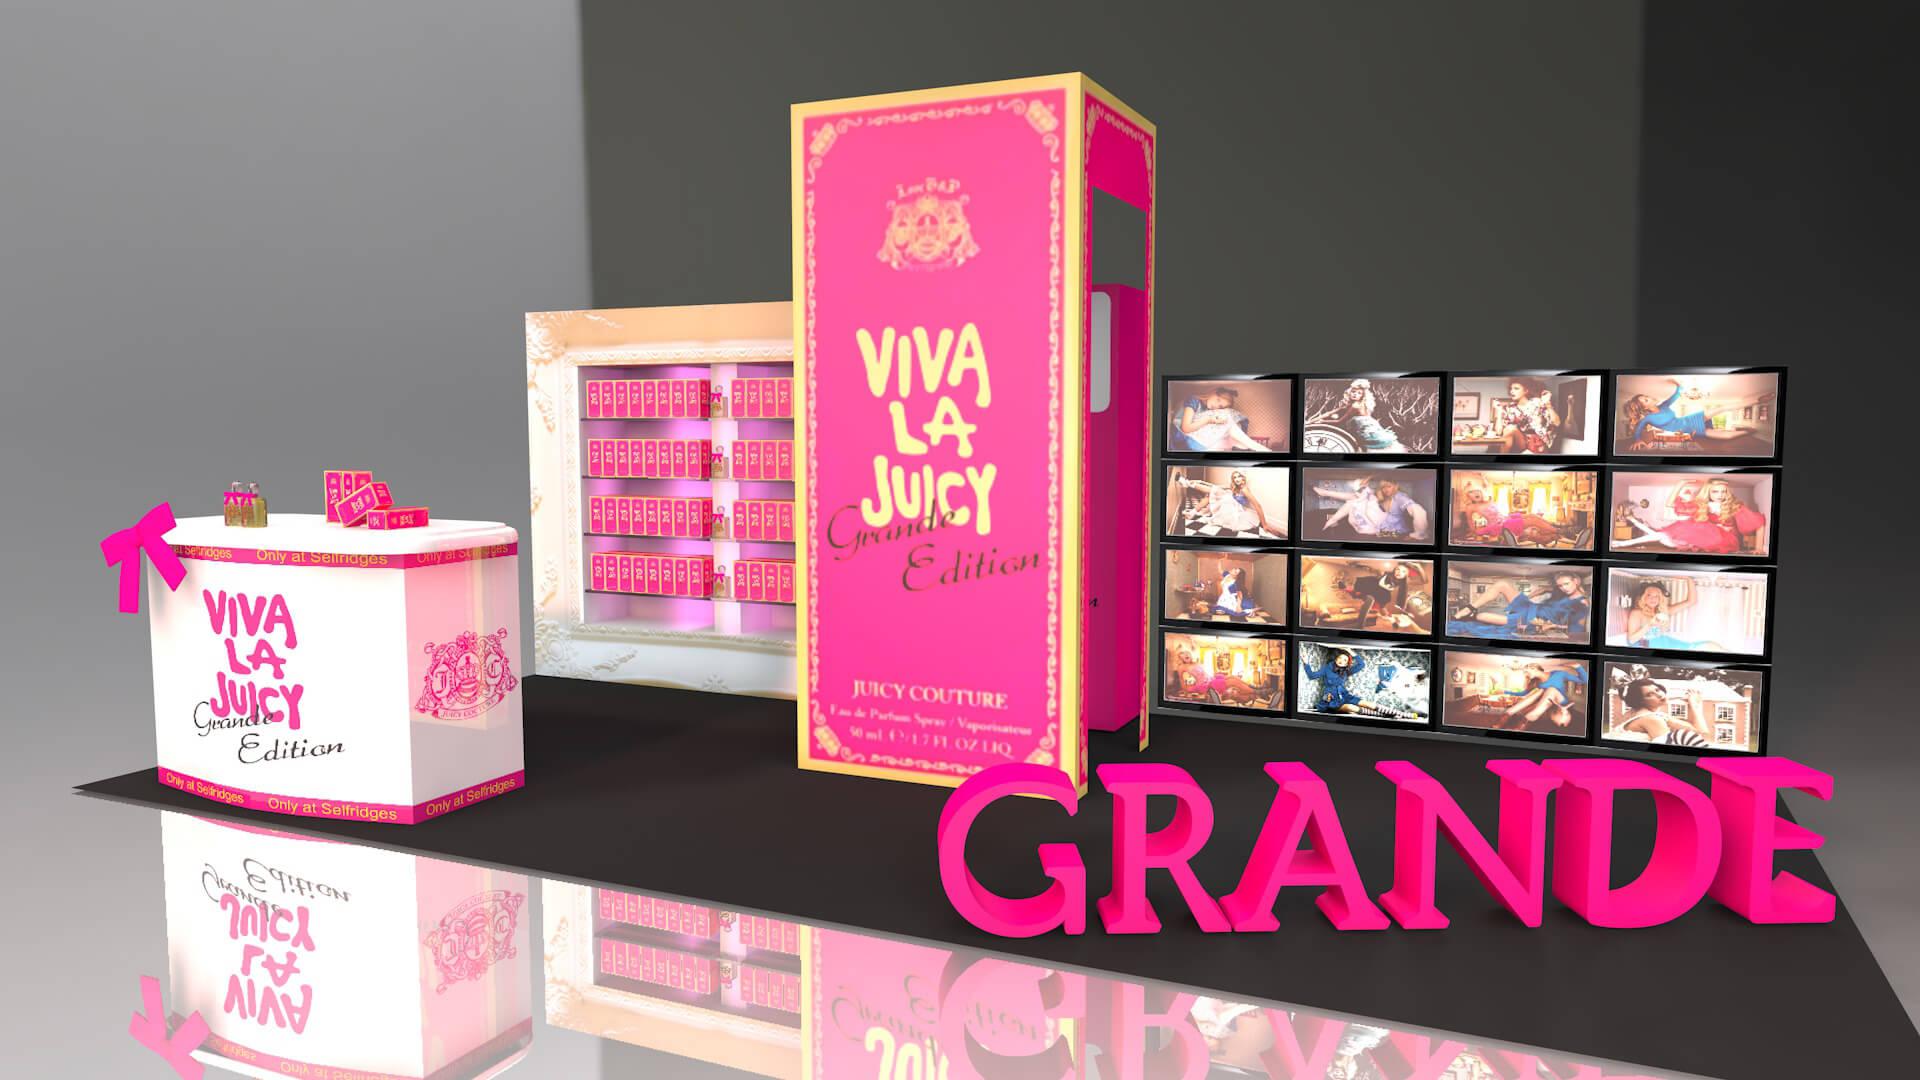 Viva La Juicy Stand Design 3d Pop up shop